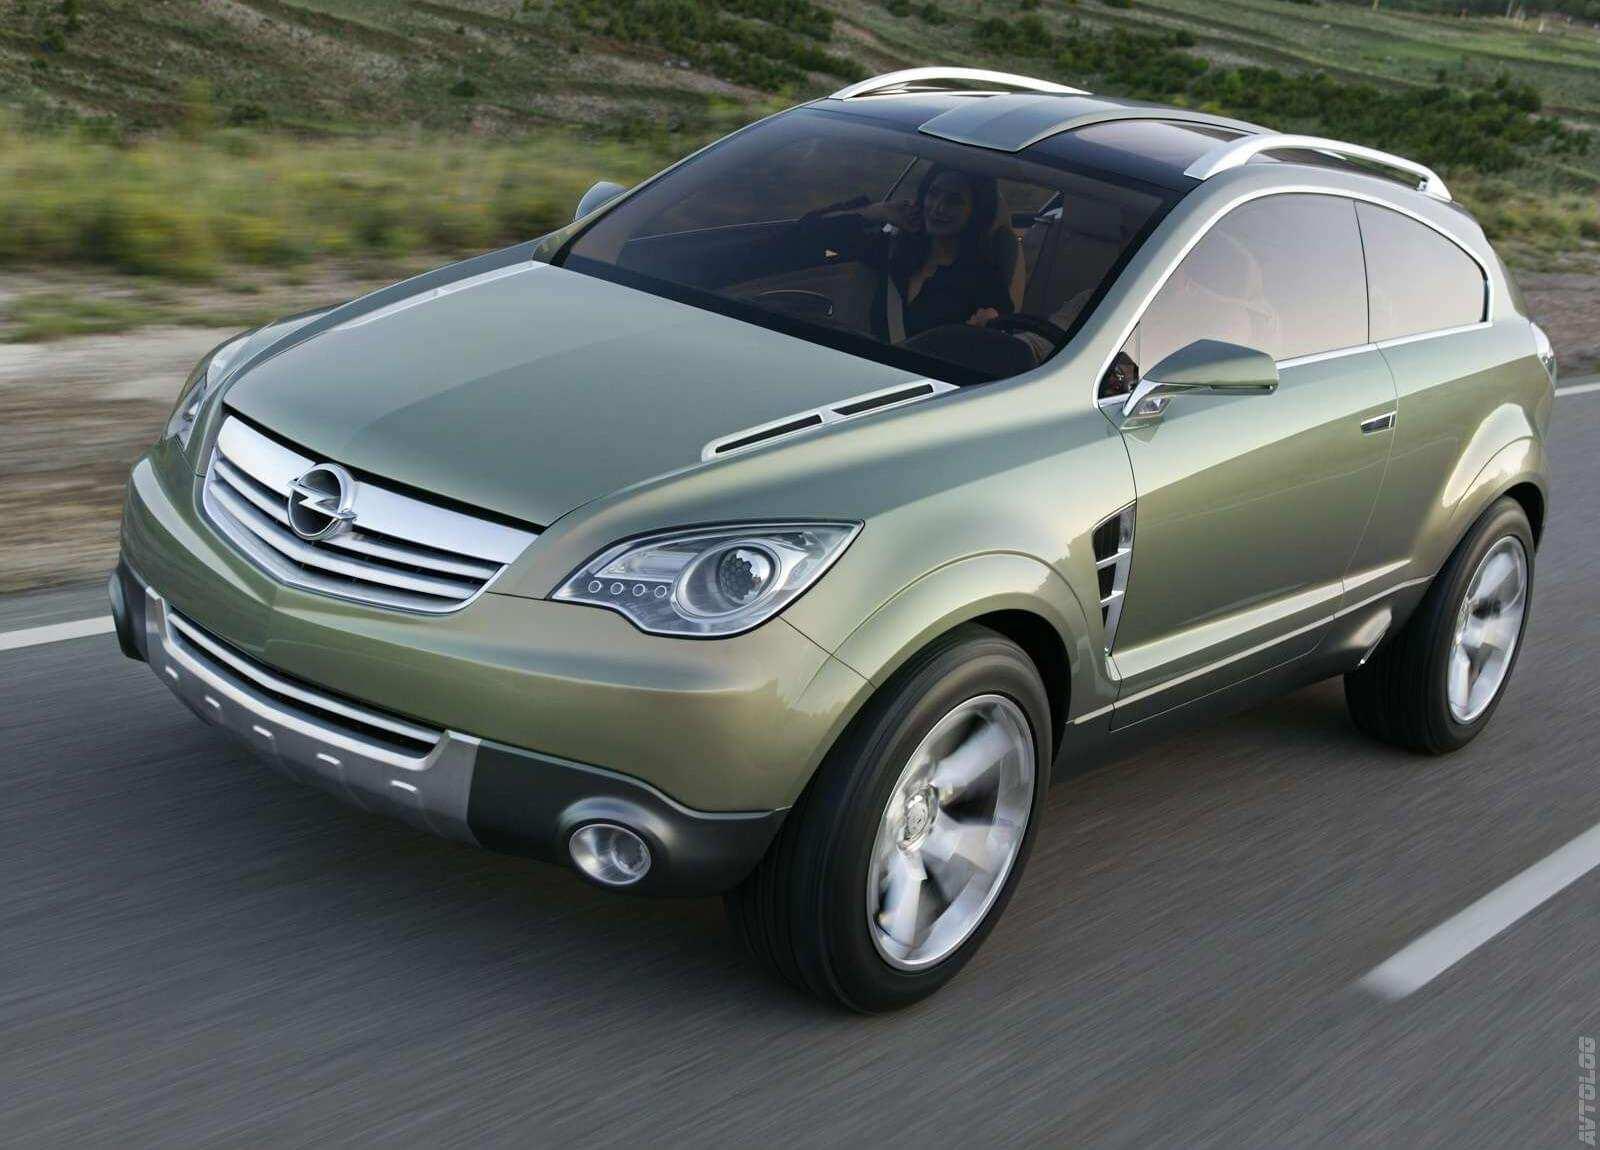 73 All New Opel Antara 2019 New Concept by Opel Antara 2019